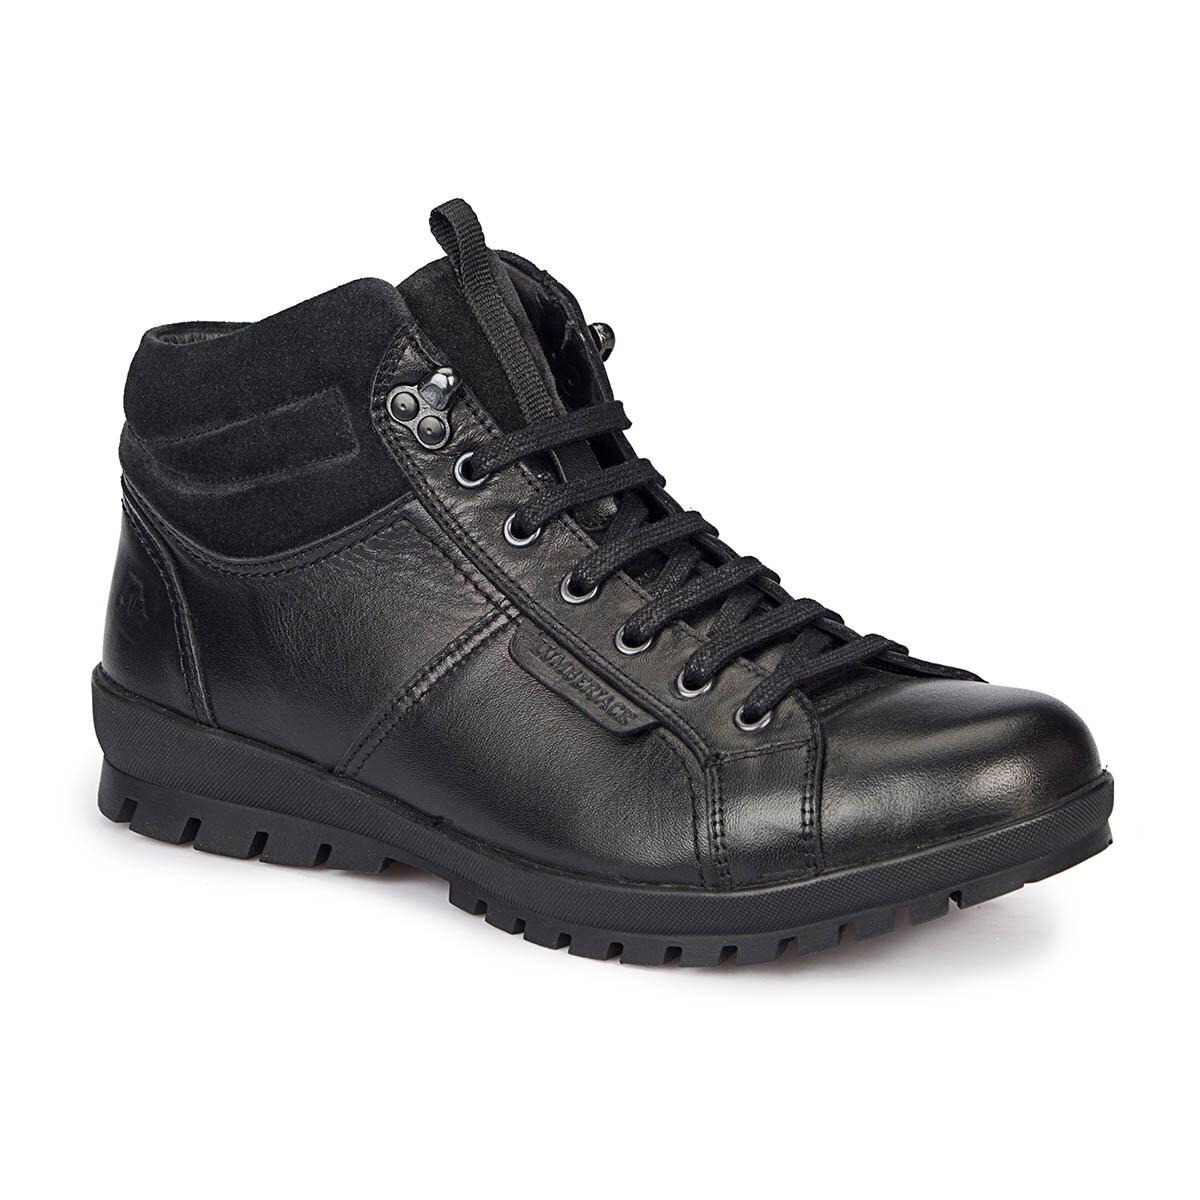 FLO CORTINA HI Black Men Boots LUMBERJACK